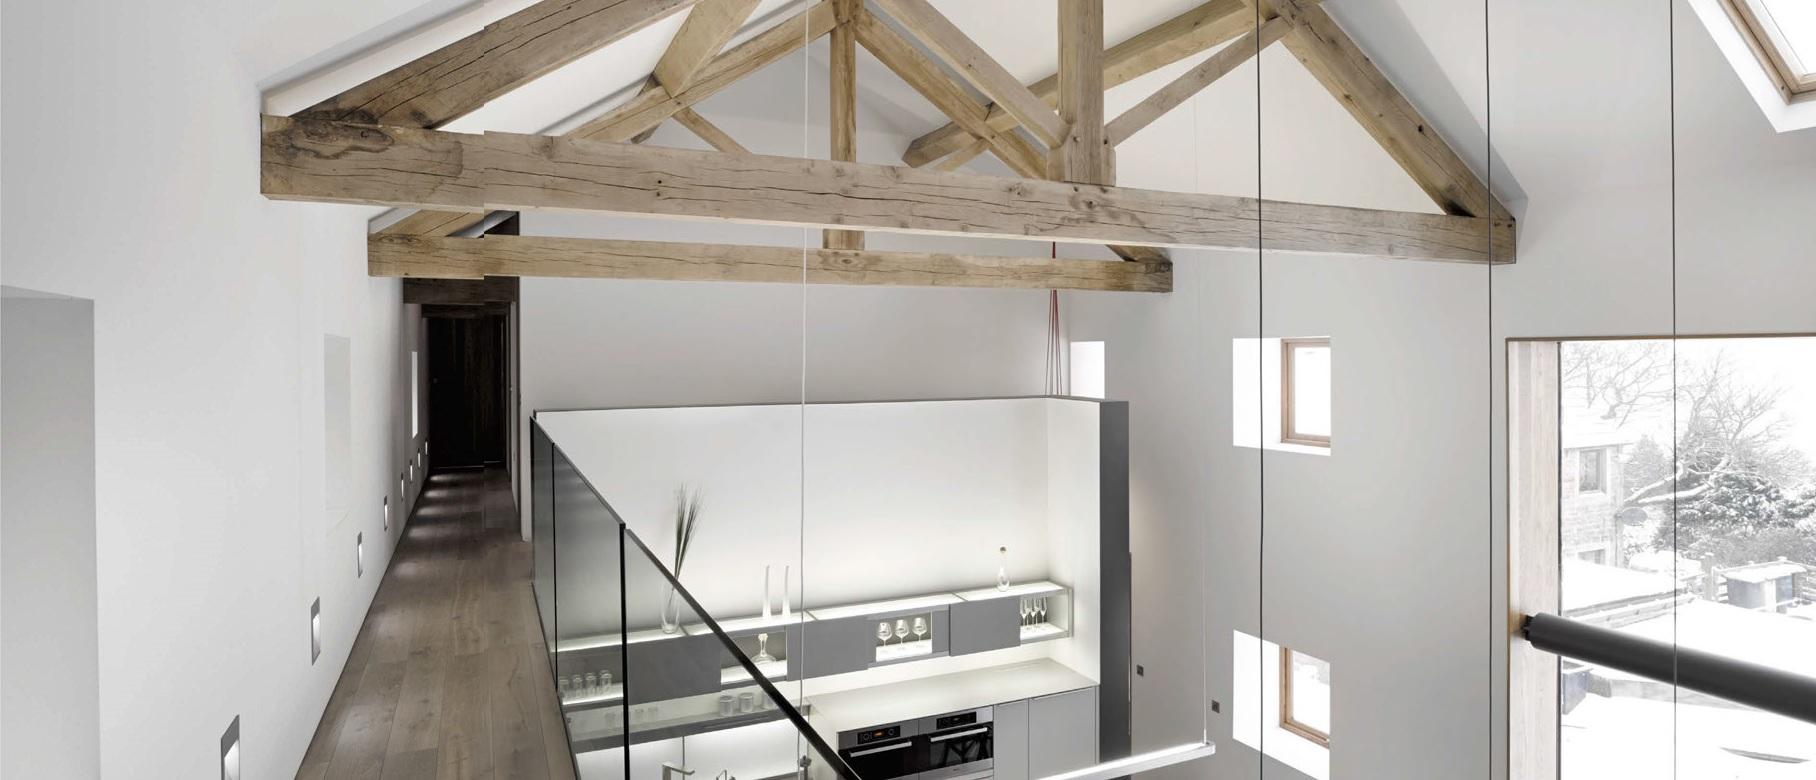 Una cucina a due piani in fienile ristrutturato ville casali for Moderna casa a 2 piani